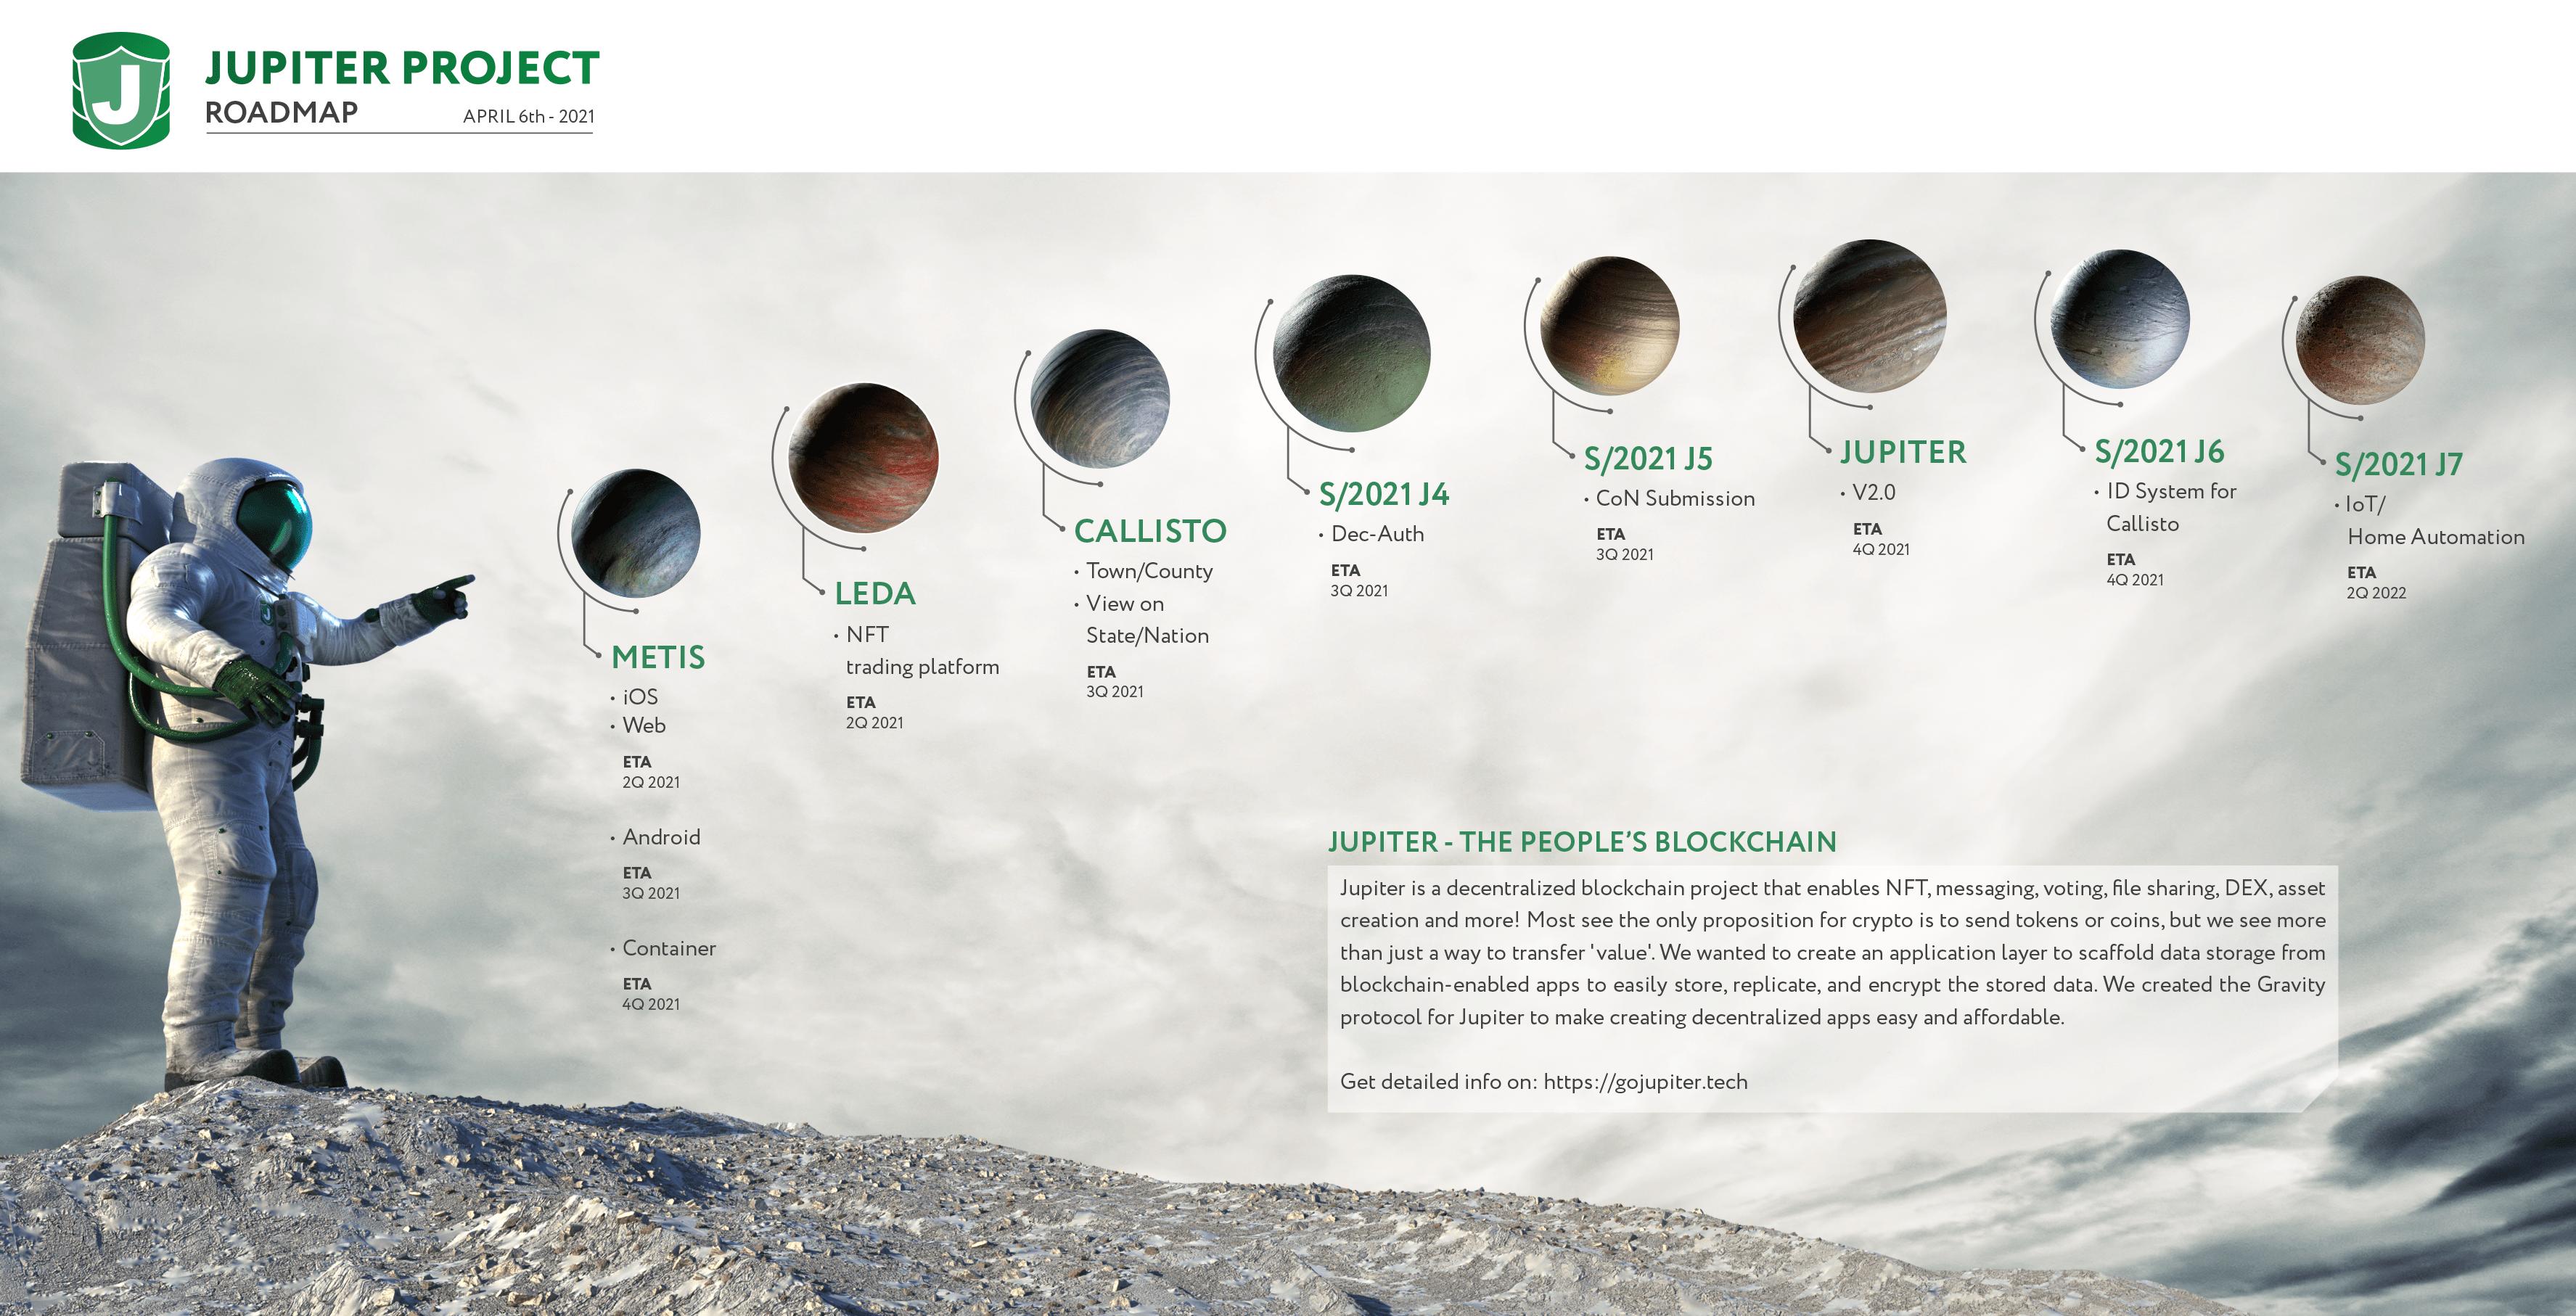 Jupiter's Roadmap